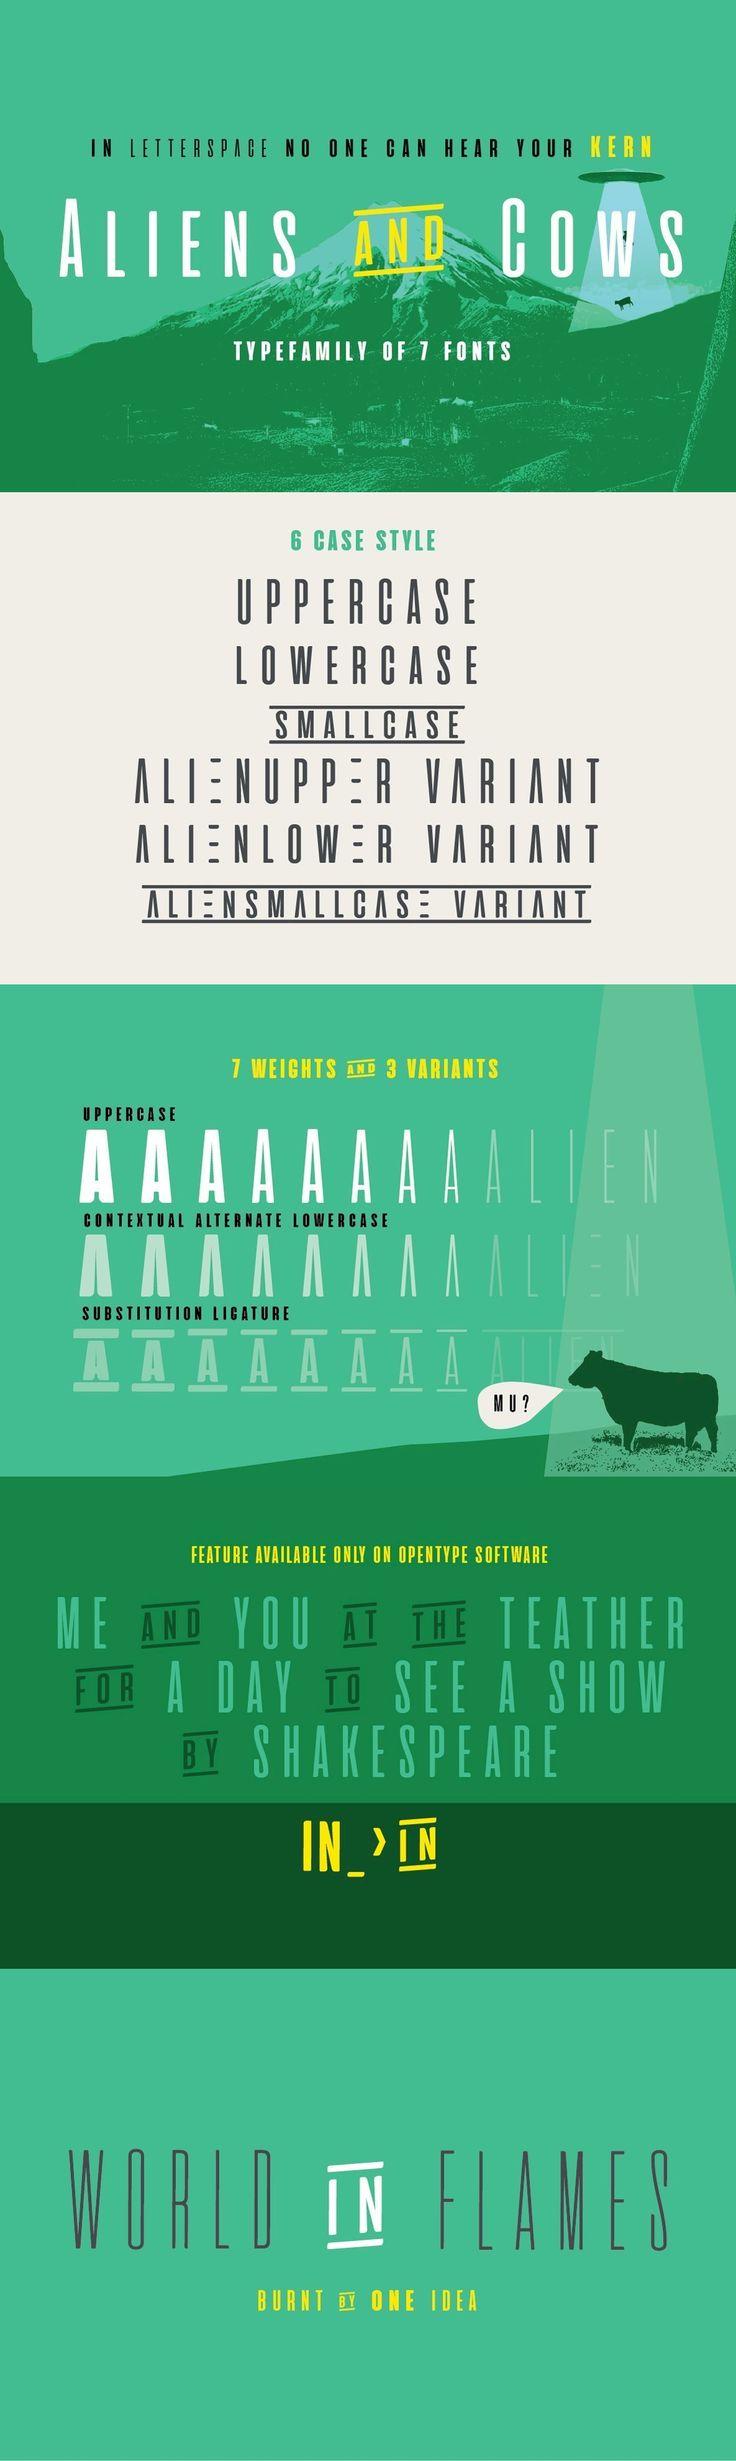 Aliens and cows fonts pinterest aliens sans serif and cow aliens and cows aliens and cows is an ultra condensed sans serif display typeface designed by francesco c altavistaventures Gallery